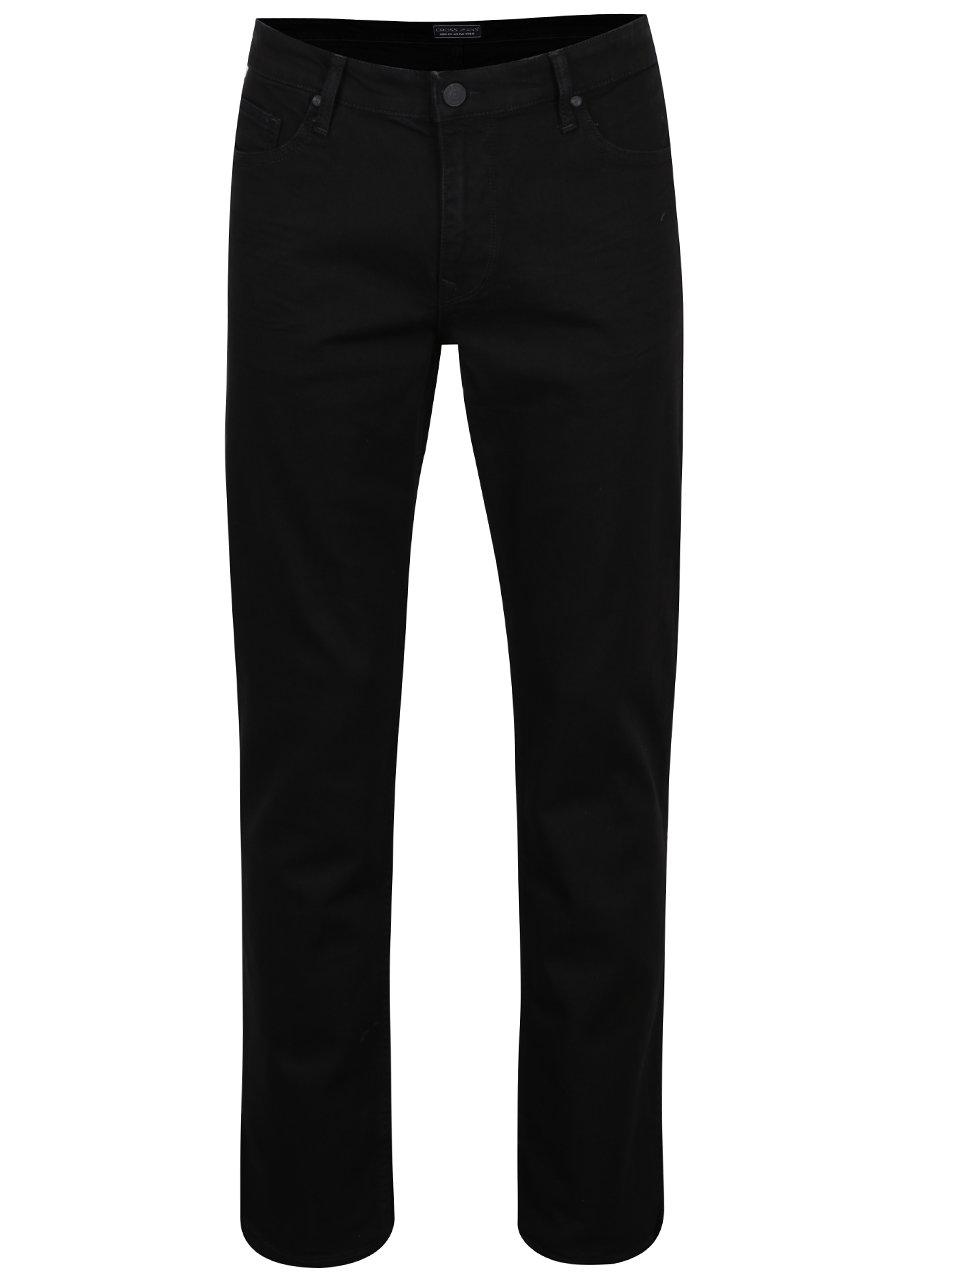 Černé pánské rovné džíny Cross Jeans Antonio